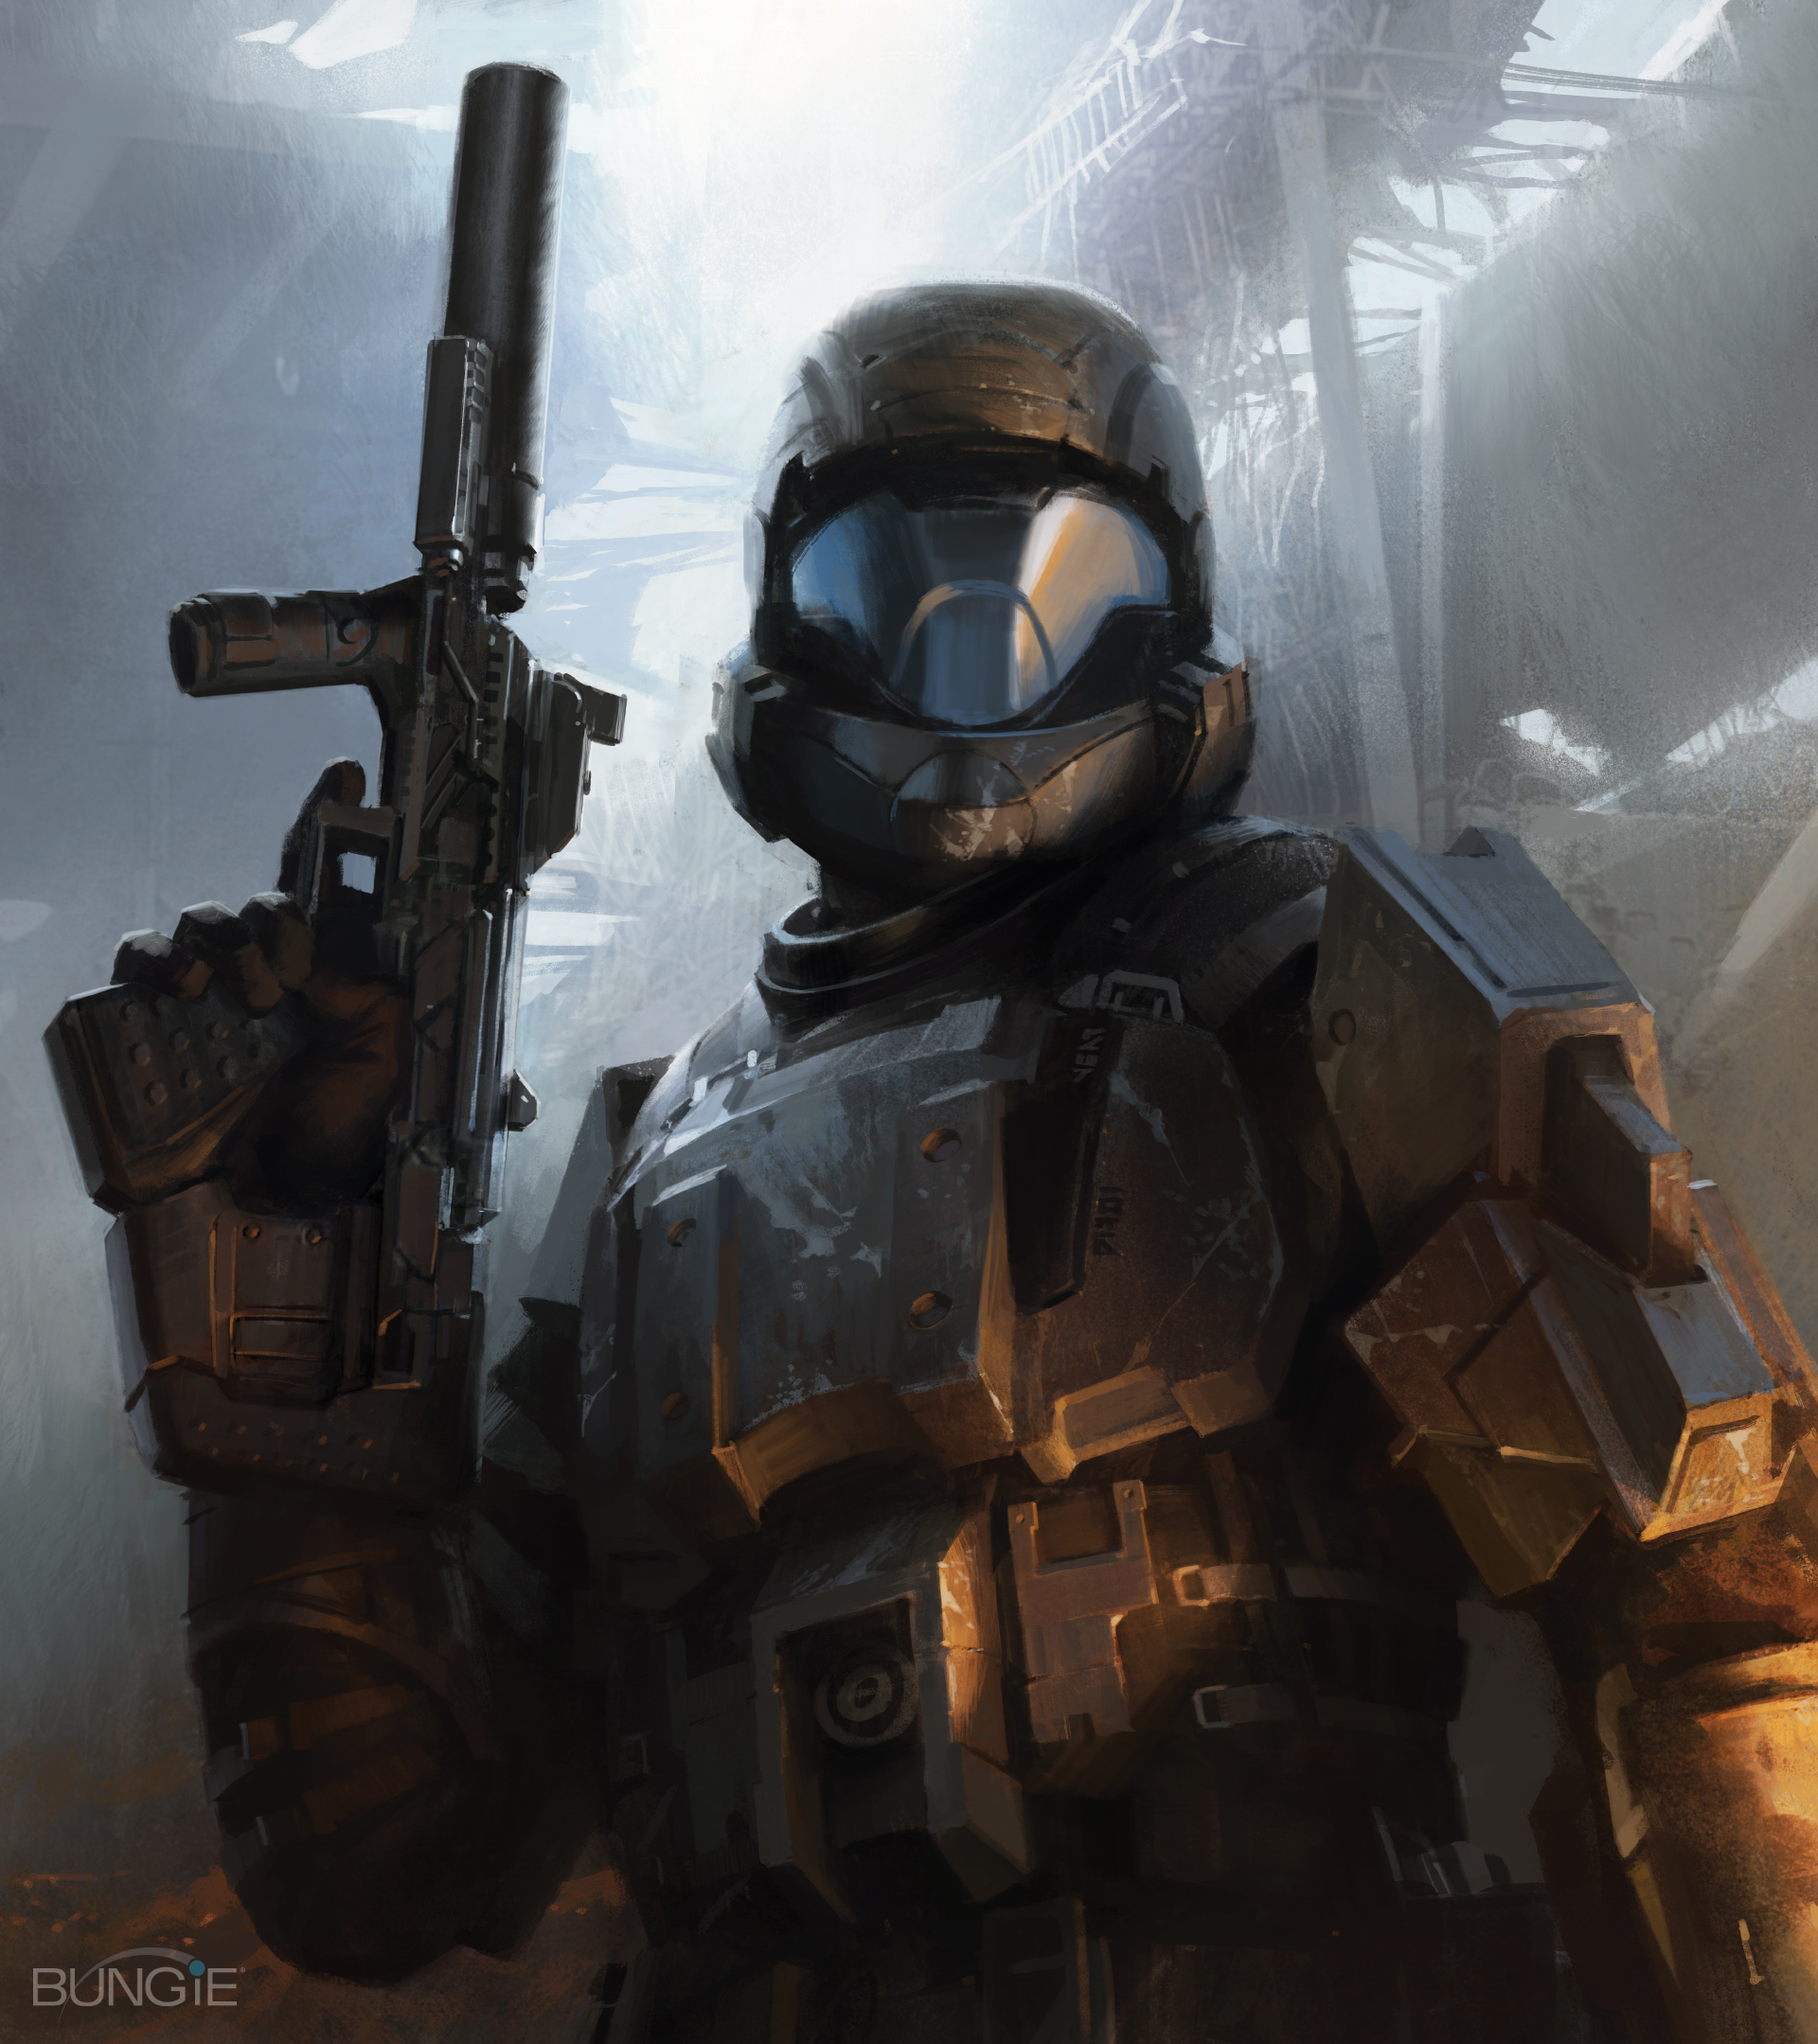 Halo 3: ODST HD wallpapers, Desktop wallpaper - most viewed